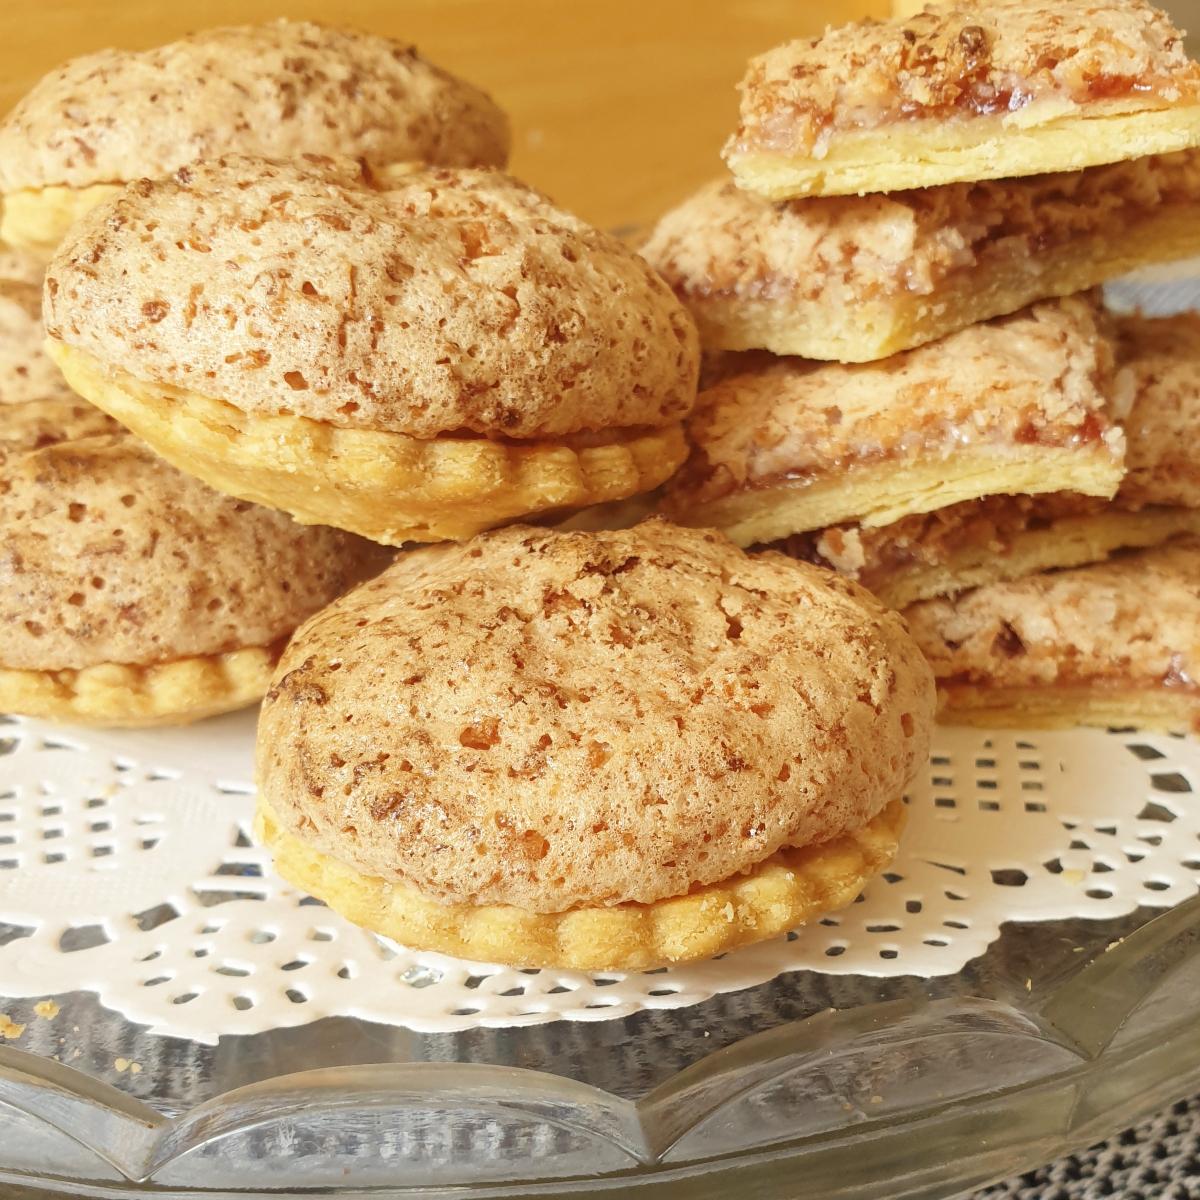 A pile of coconut meringe jam tarts.